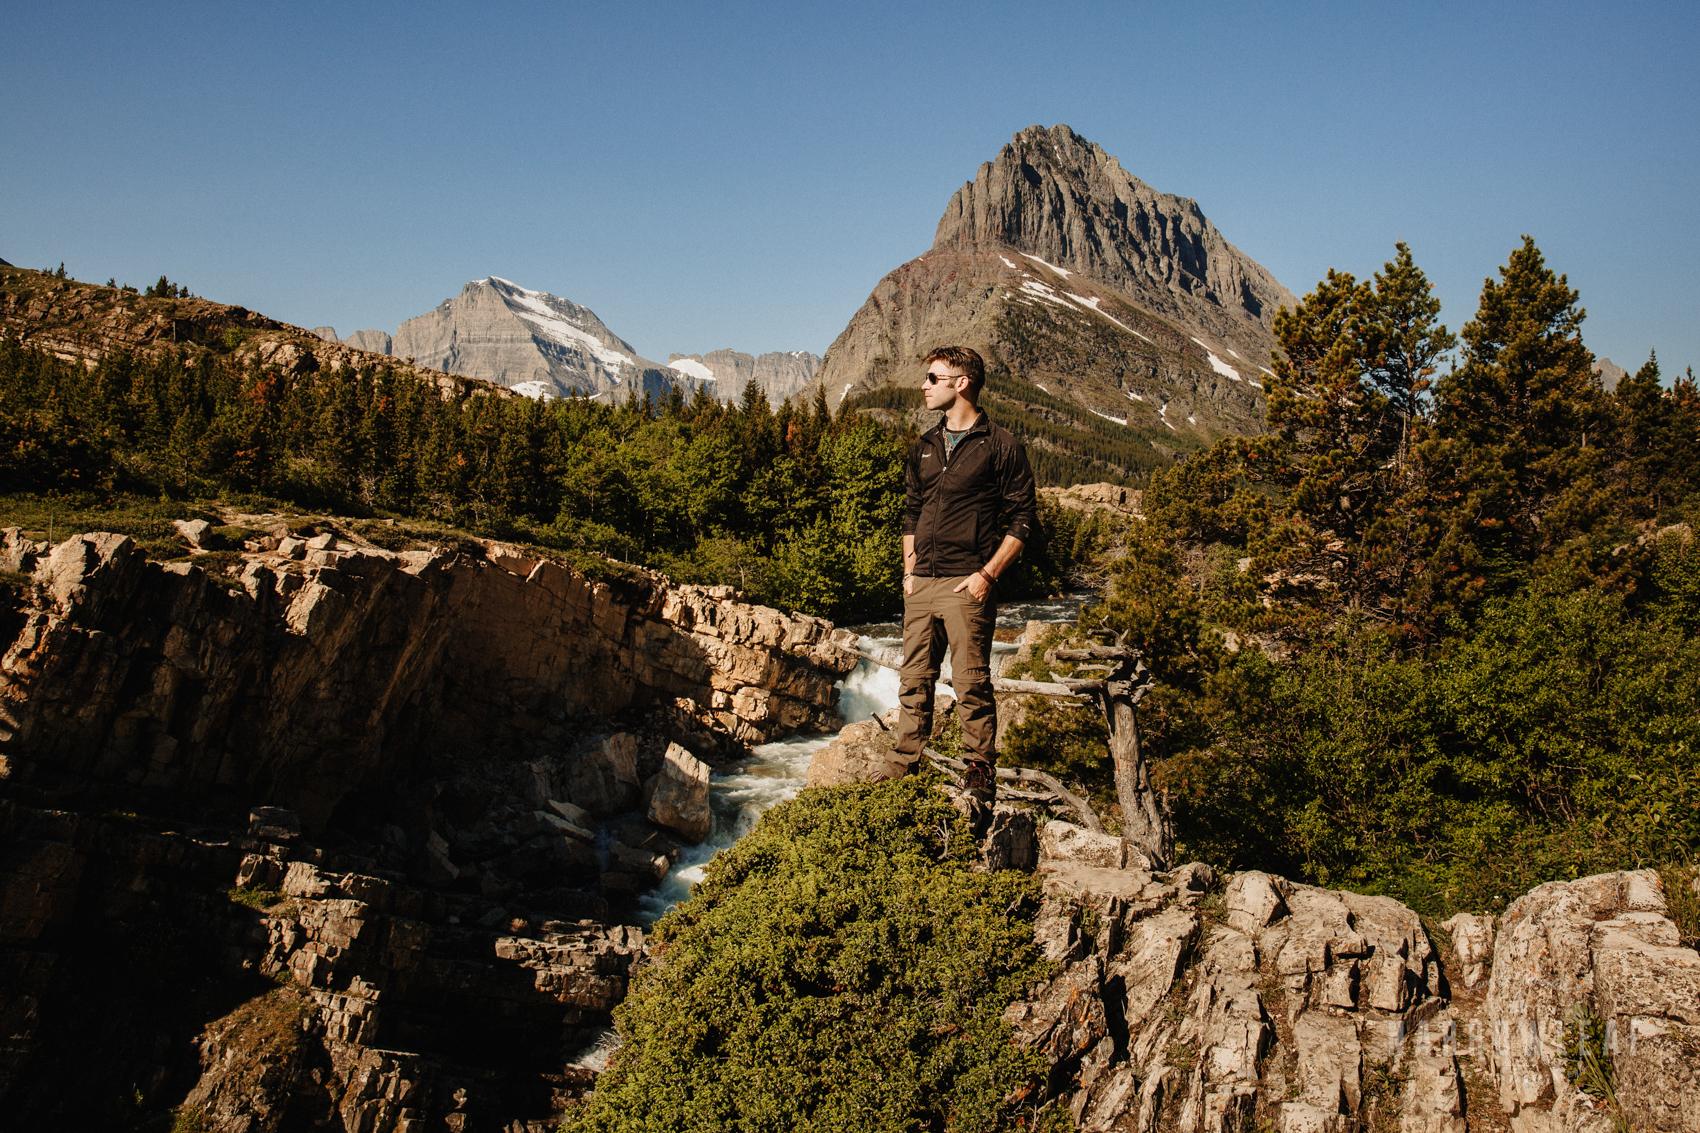 Montana-Glacier-National-Park-Many-Glacier-Narrowleaf-Love-and-Adventure-elopement-Photography-9299.jpg